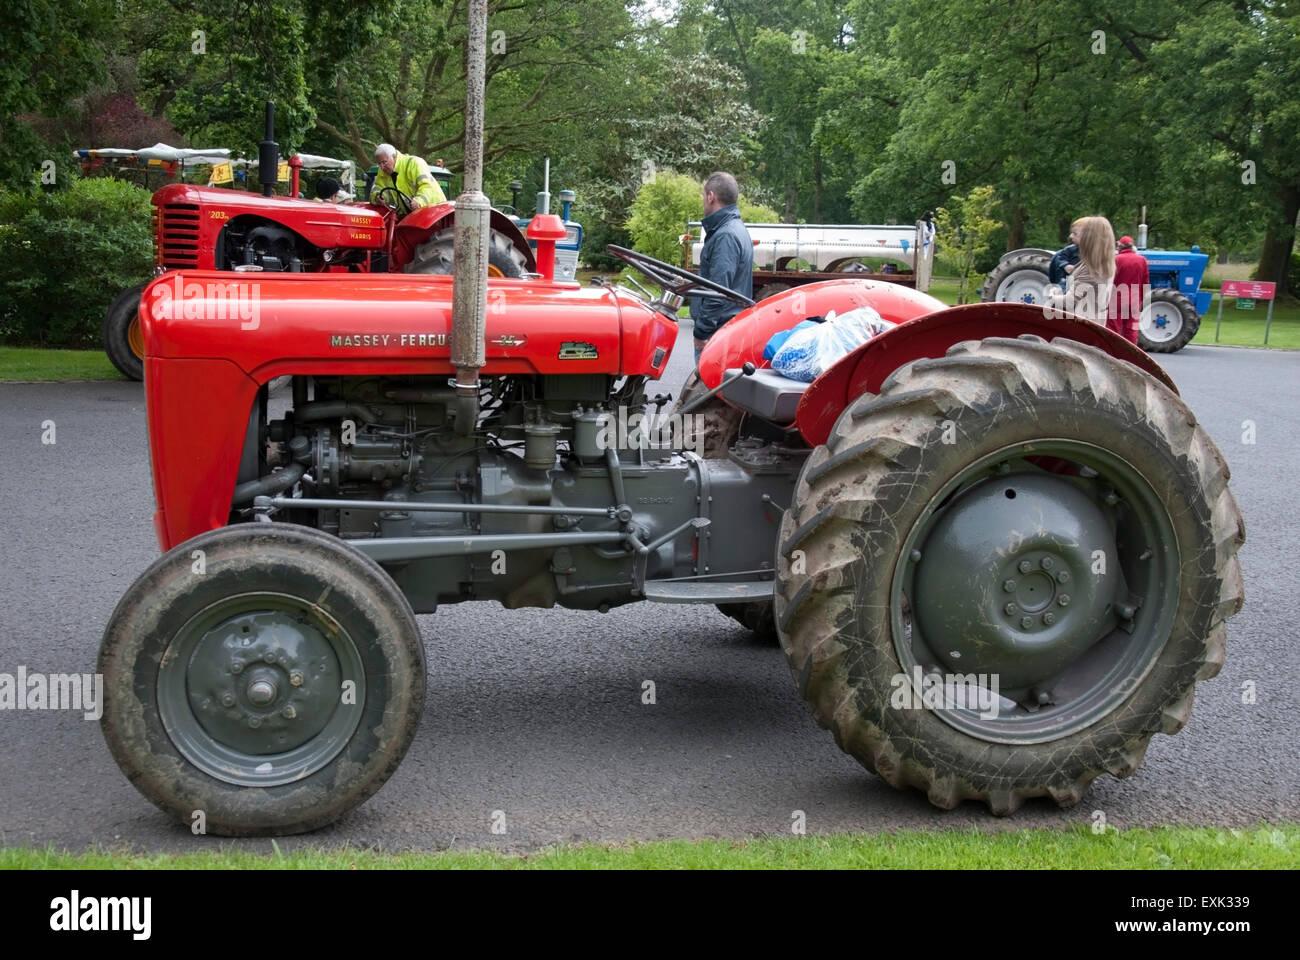 1961 red massey ferguson 35 model farm tractor stock photo. Black Bedroom Furniture Sets. Home Design Ideas